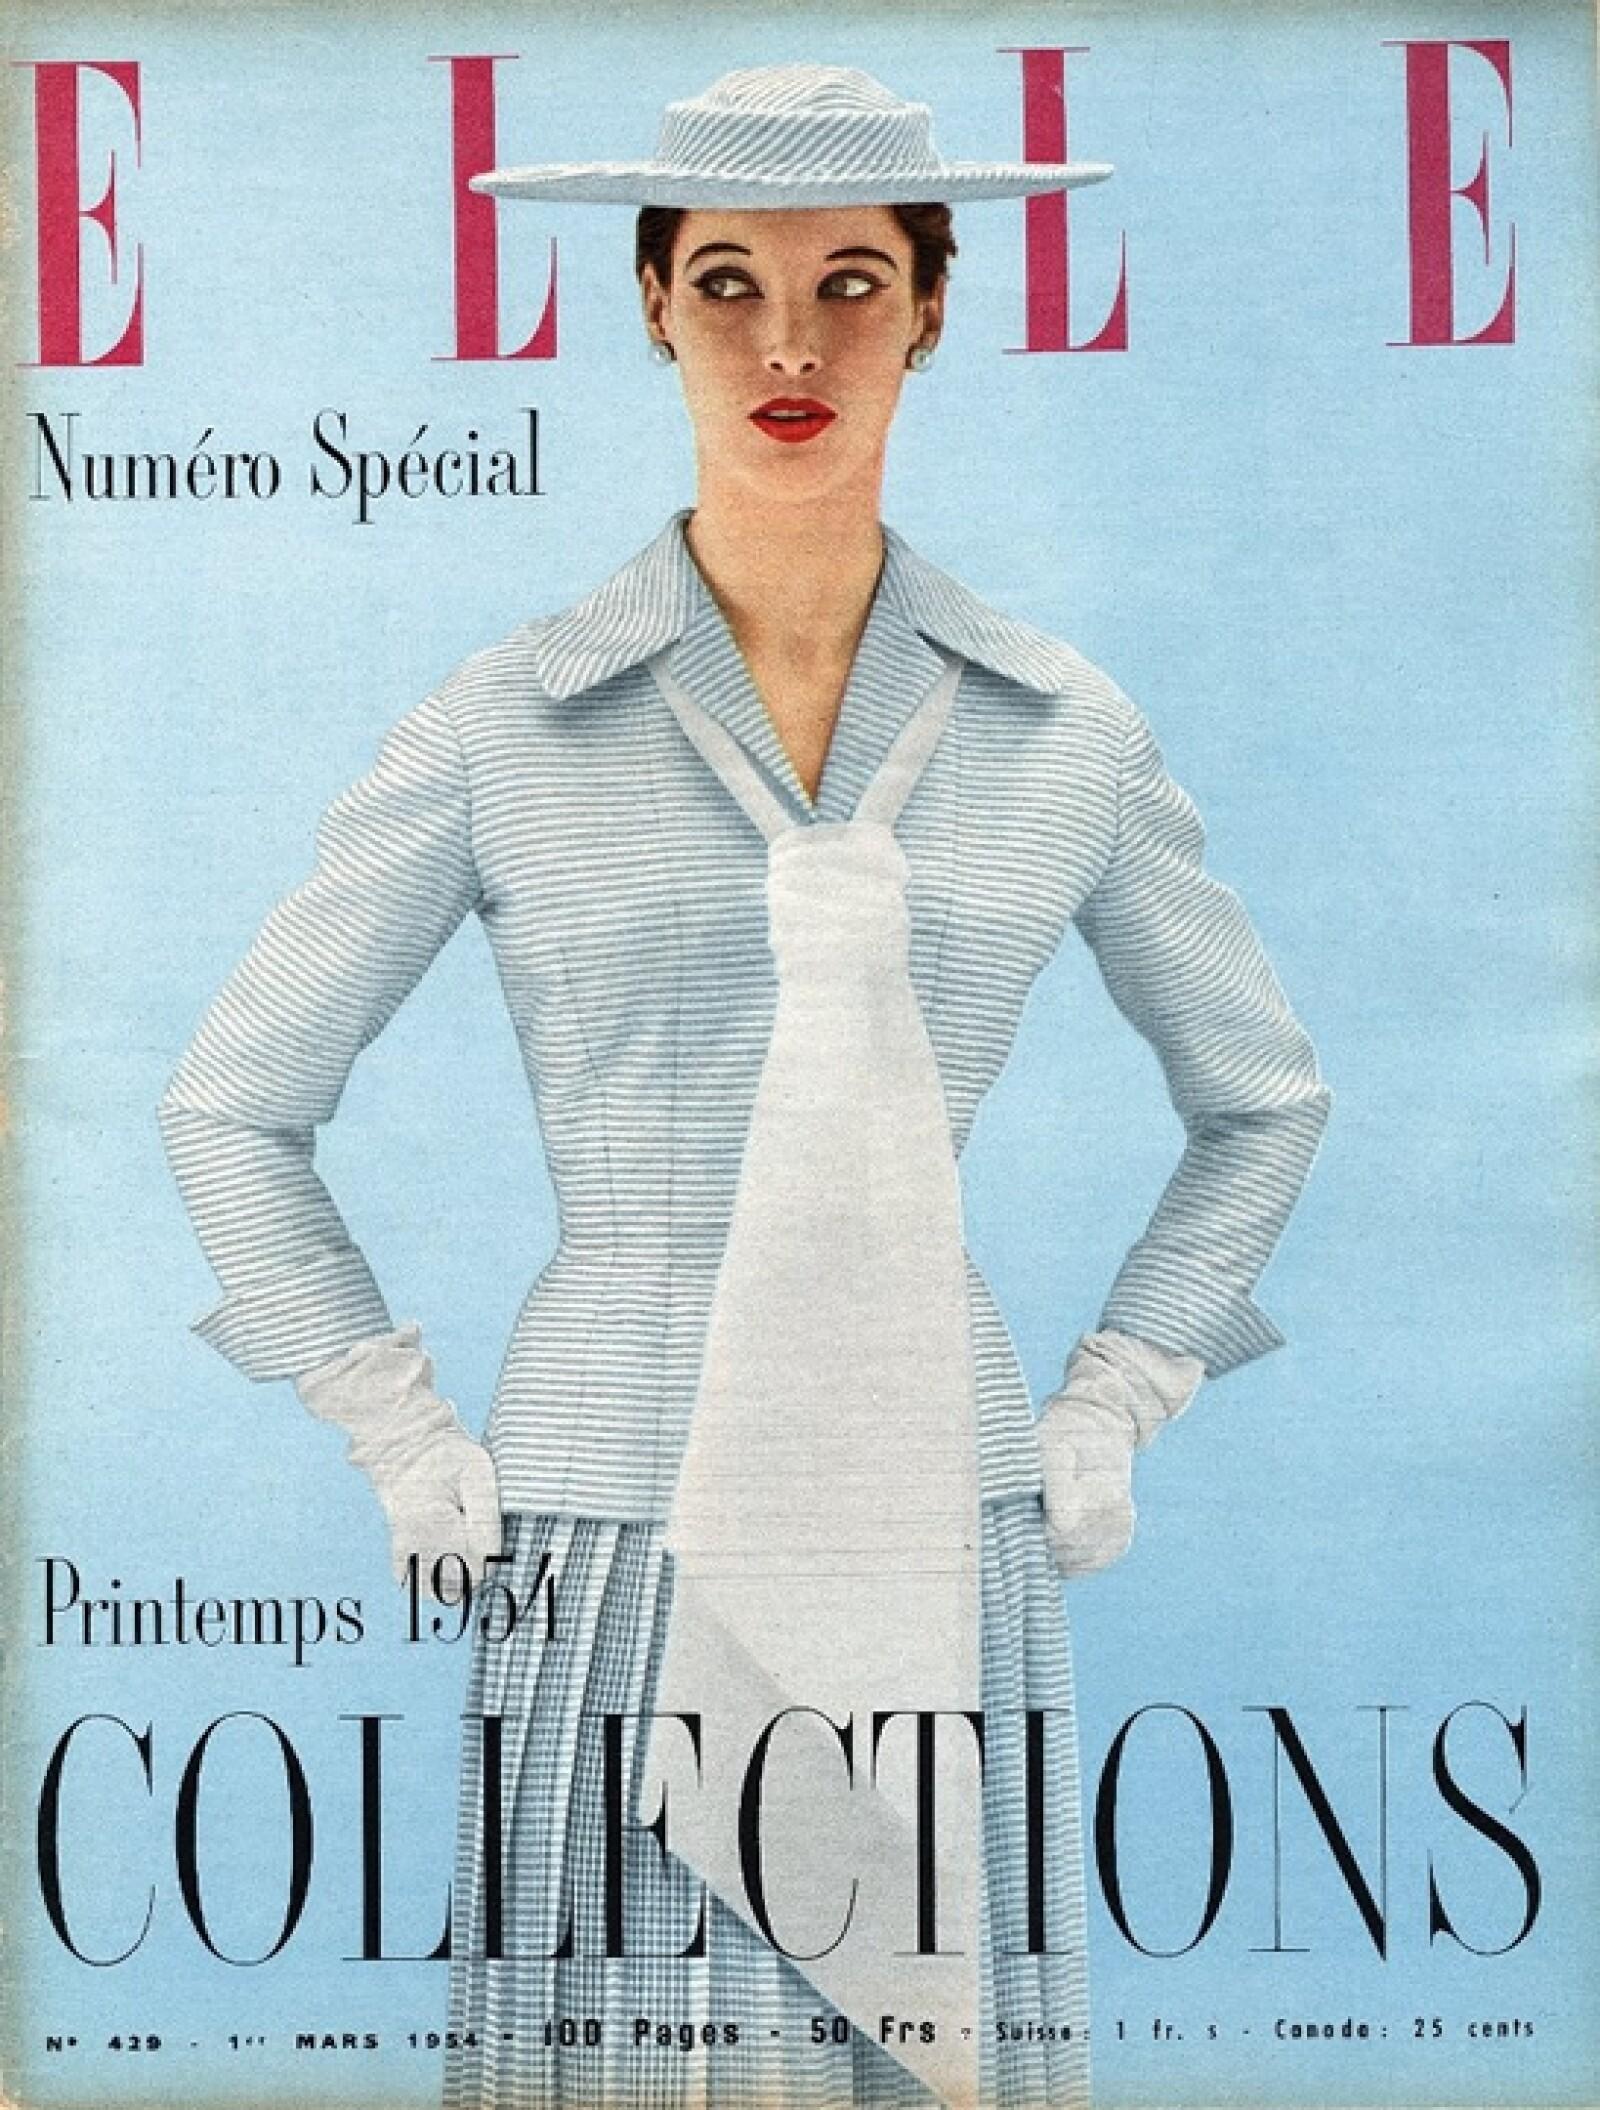 ELLE, marzo 1954, edición francesa.